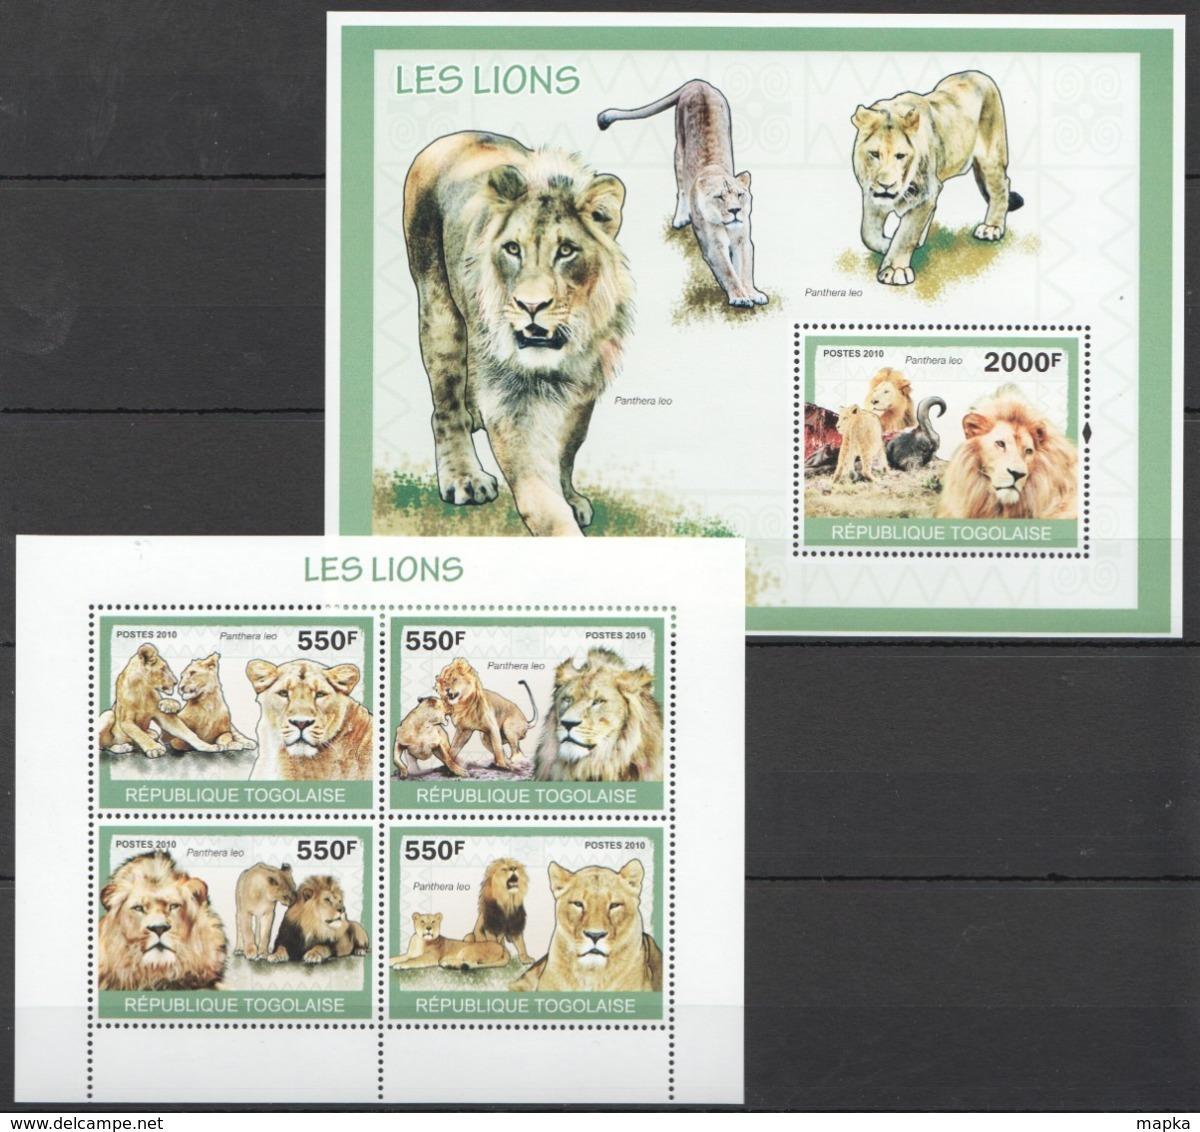 TG1287 2010 TOGO TOGOLAISE FAUNA ANIMALS LES LIONS 1KB+1BL MNH - Felini